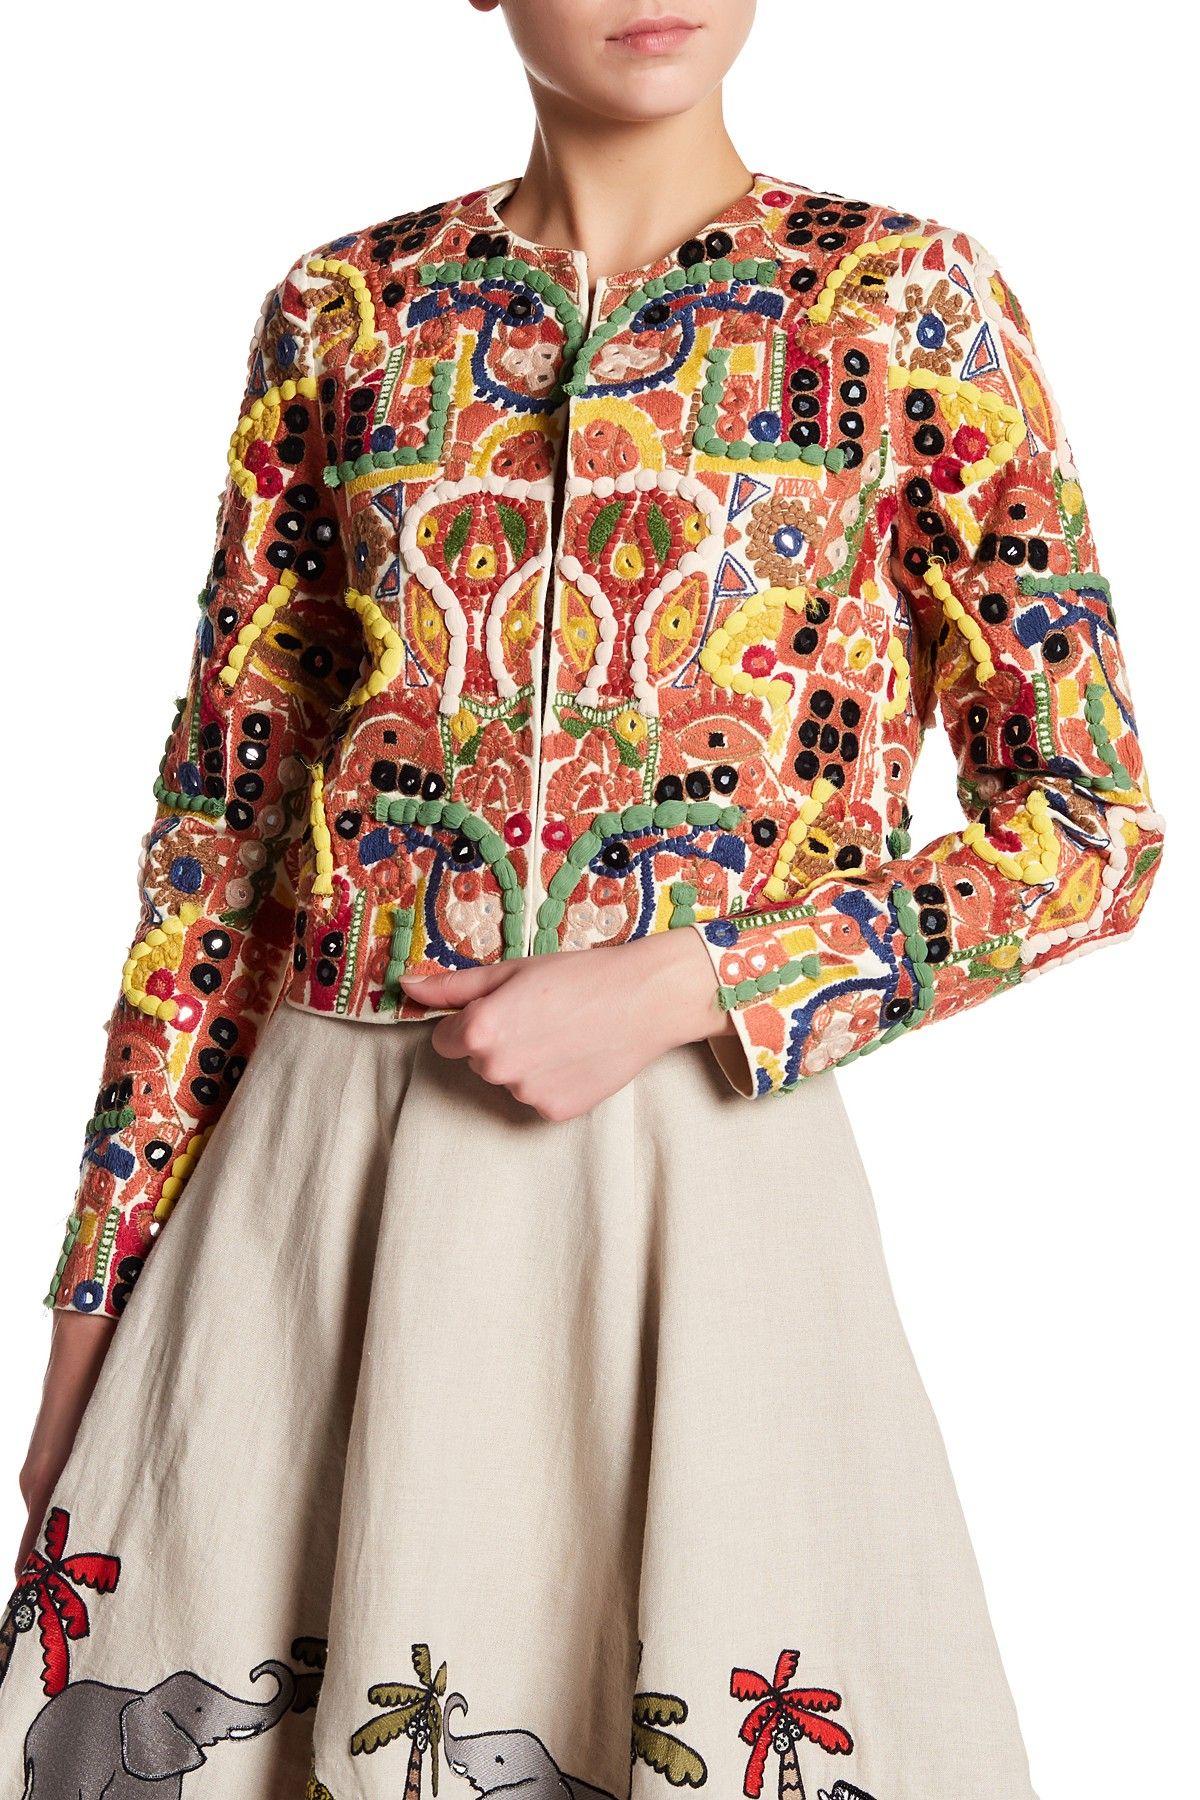 Yoana baraschi celestial garden lace dress nordstrom rack - Kidman Embroidered Jacket